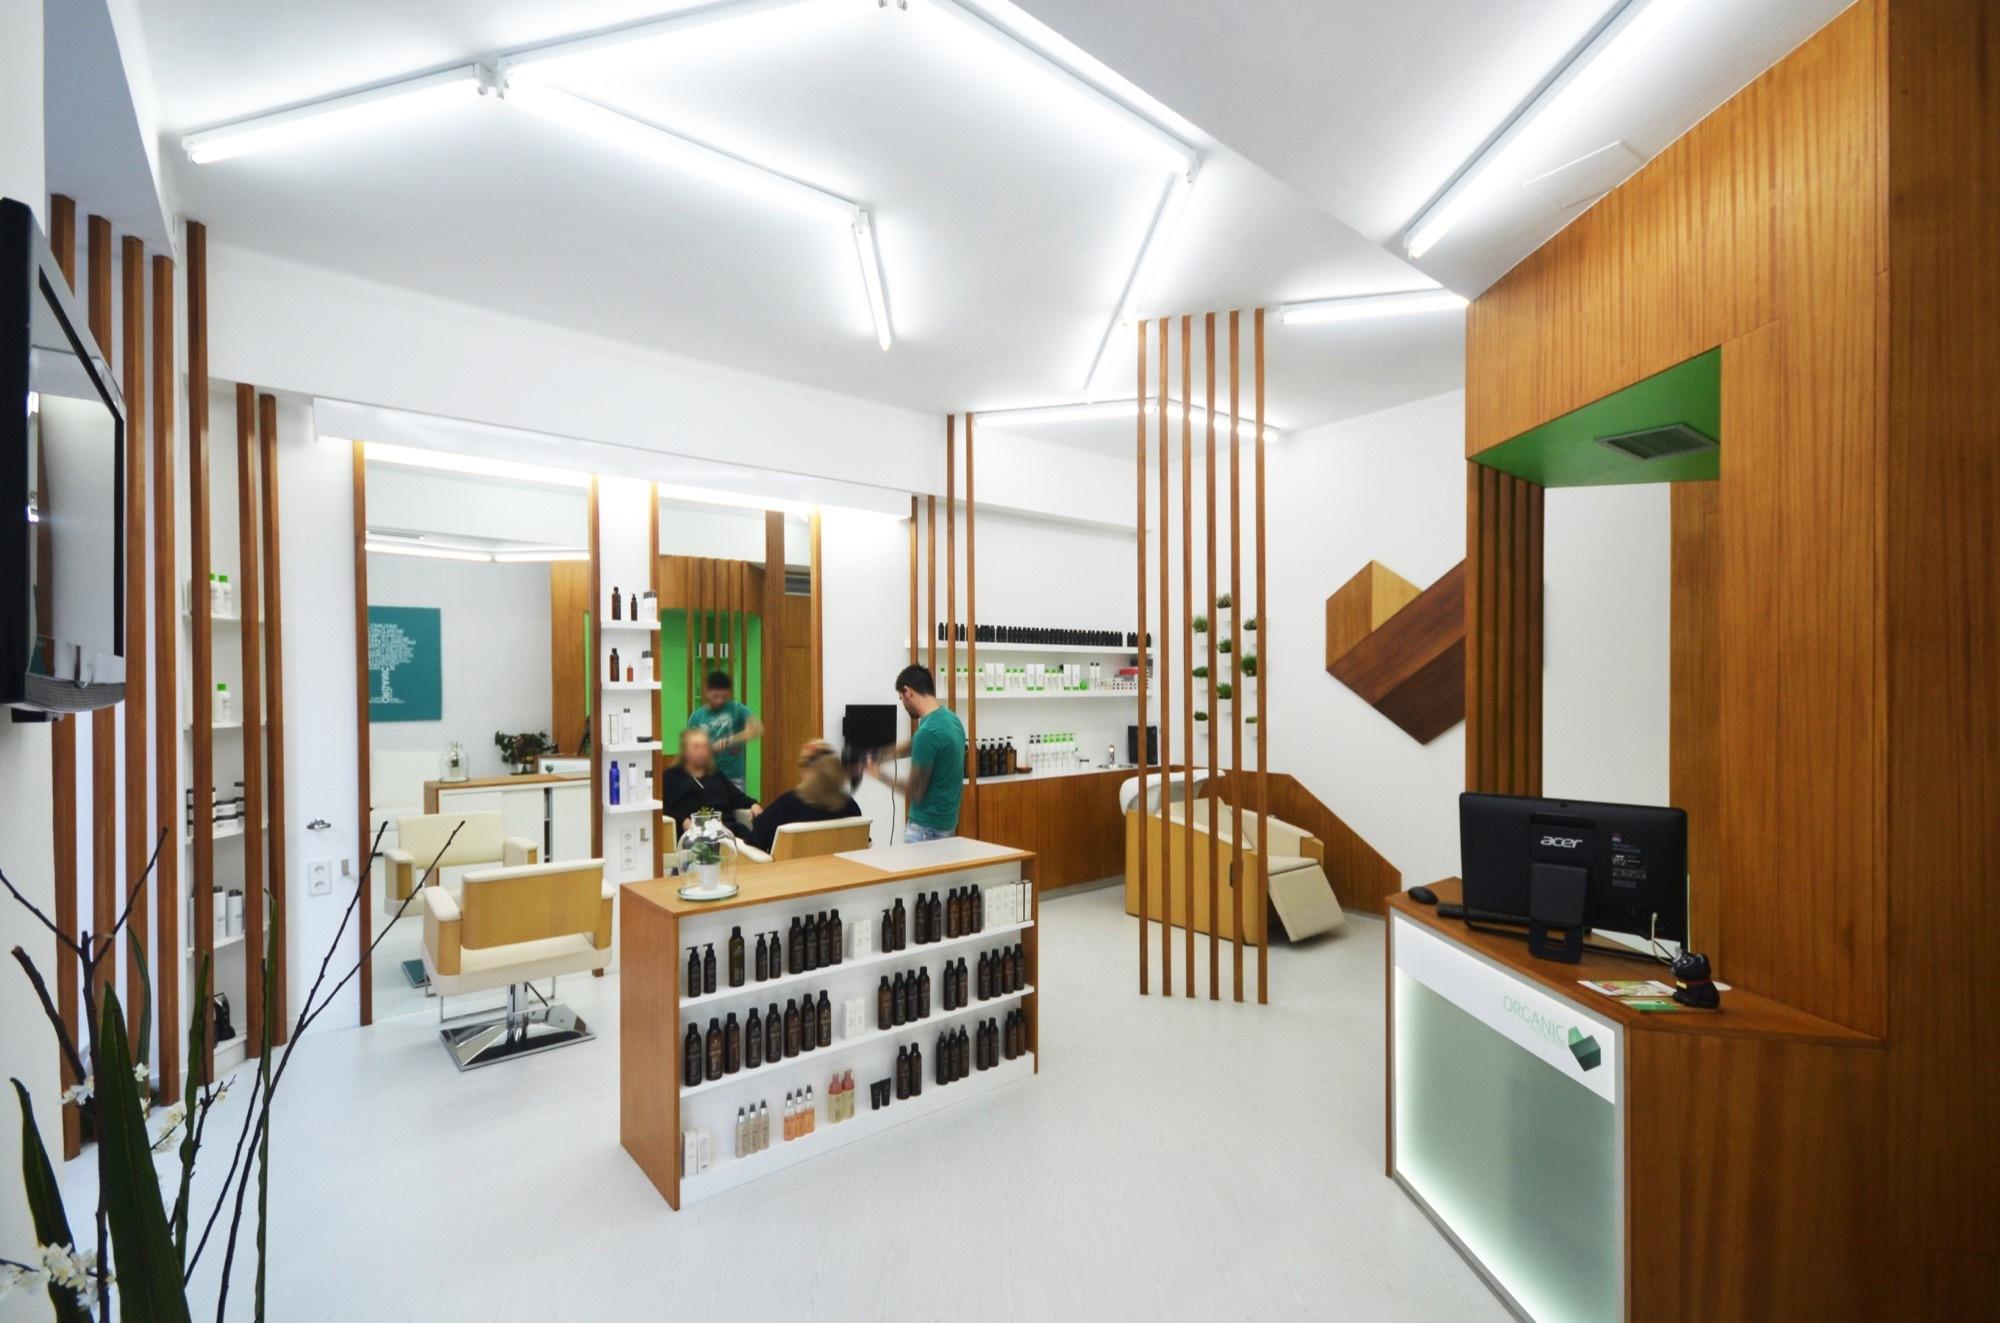 Peluquer a organic liqe arquitectura plataforma for Iluminacion para peluquerias